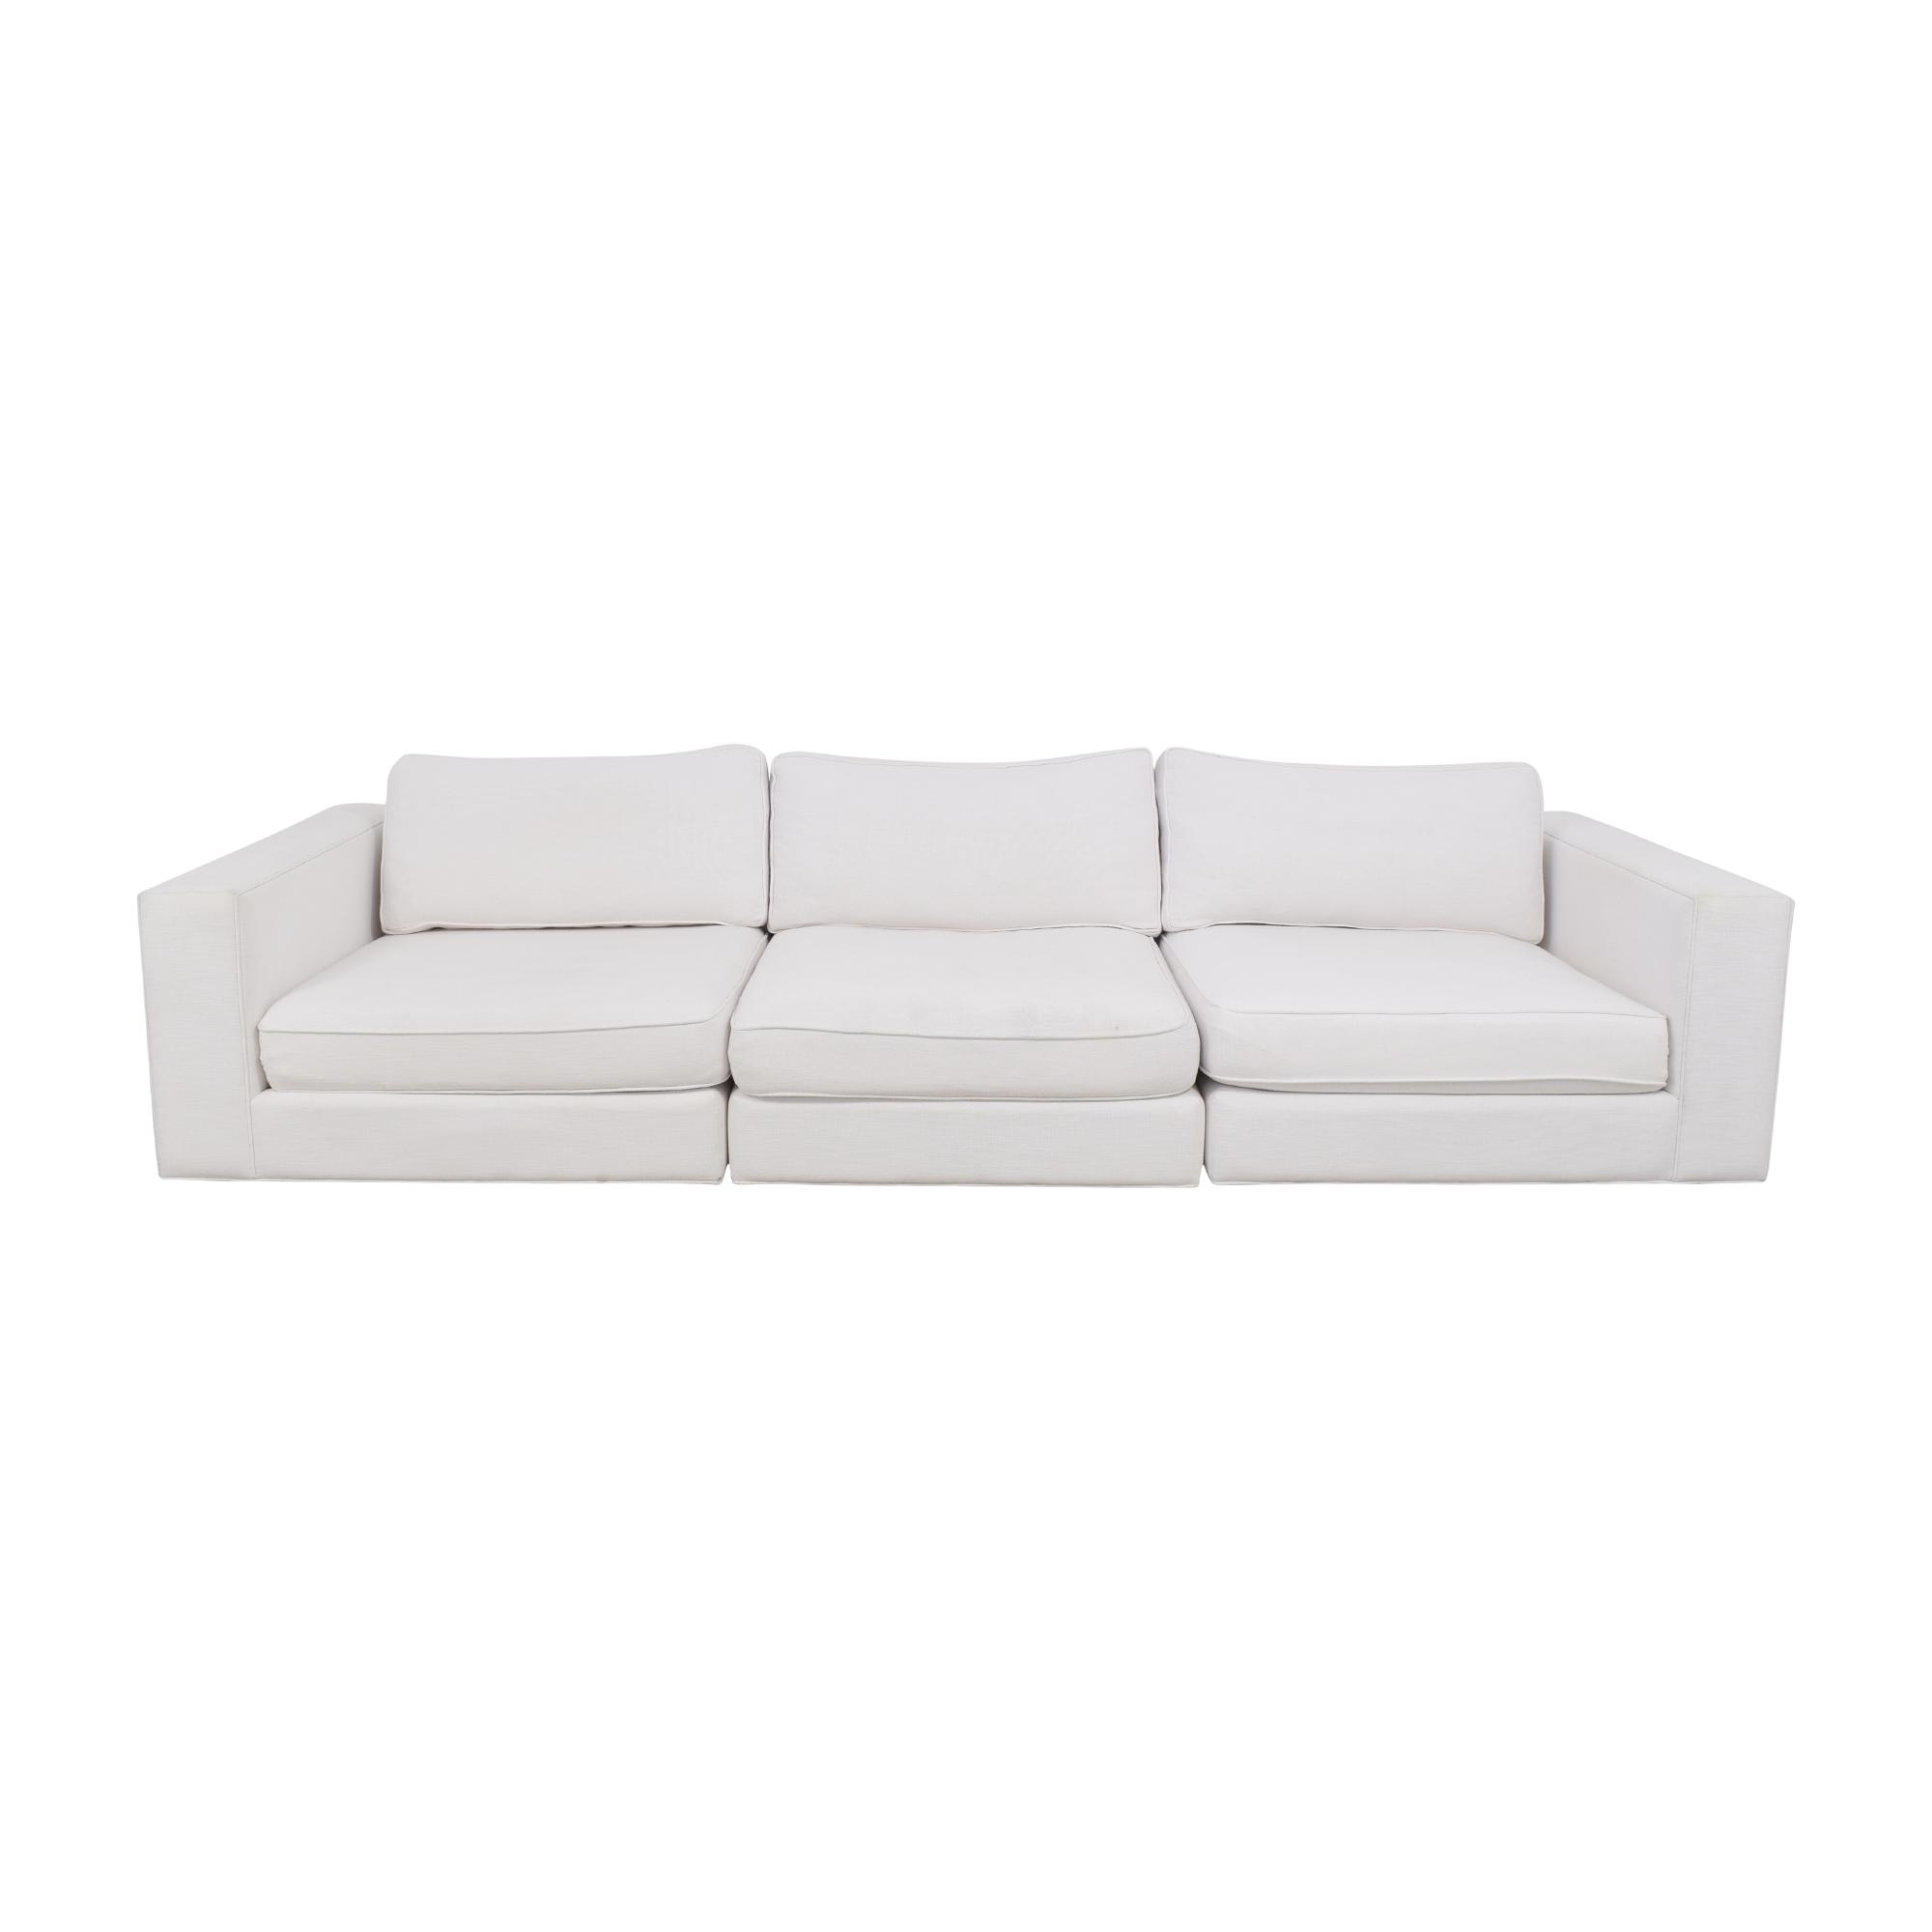 buy Restoration Hardware Restoration Hardware Maddox Modular Sofa online